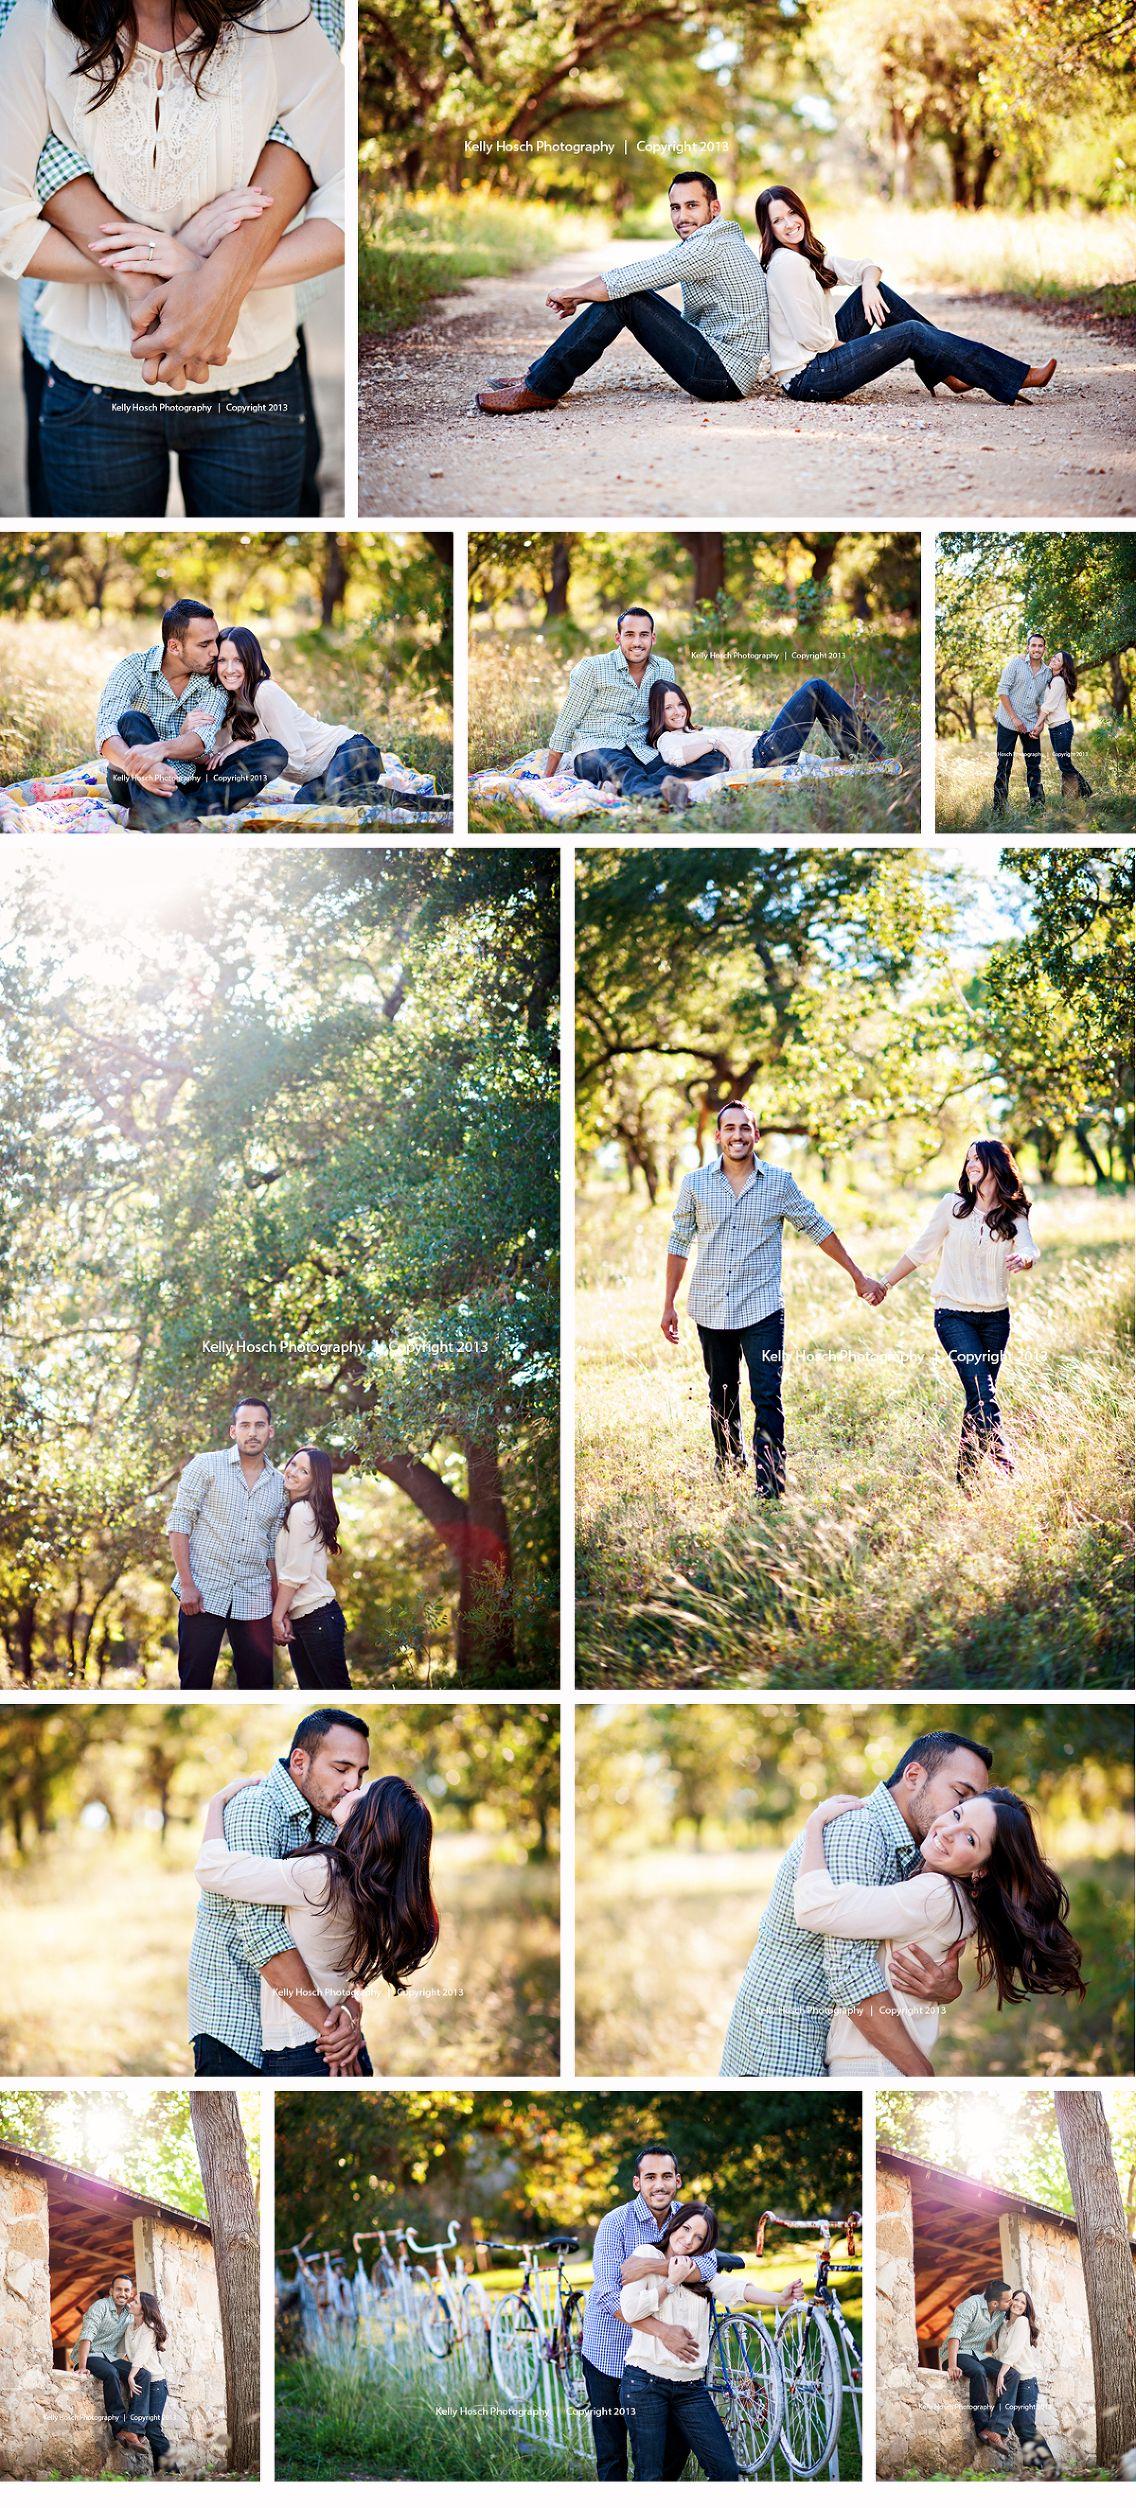 Hochzeitseinladung Foto Paar Fotos Fotoshooting Paarshooting